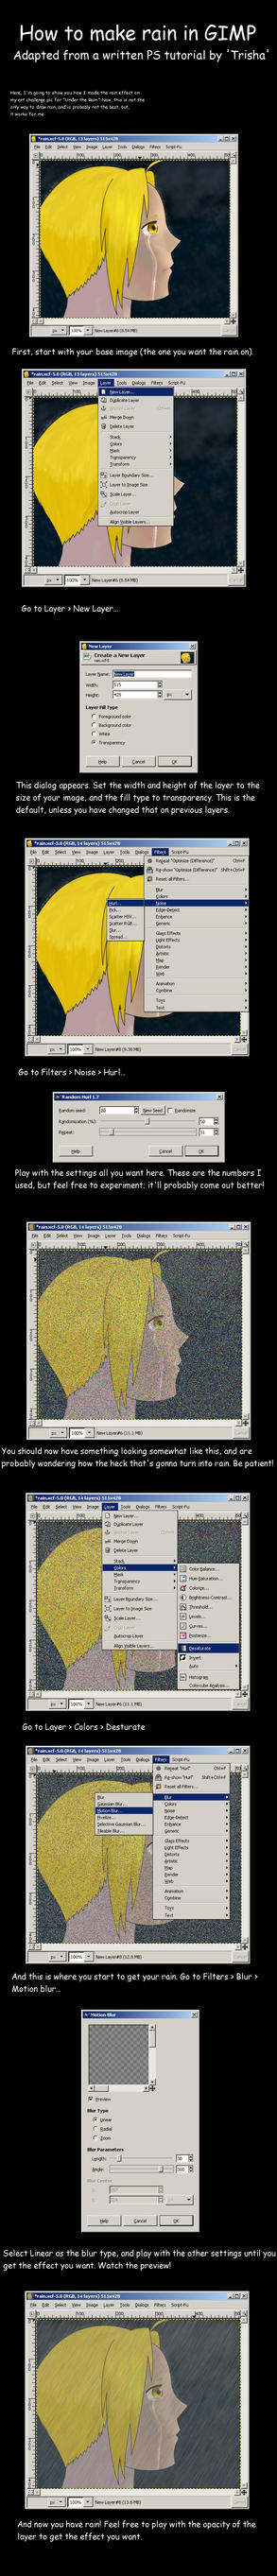 Making rain in GIMP by Fullmetal-Phantom